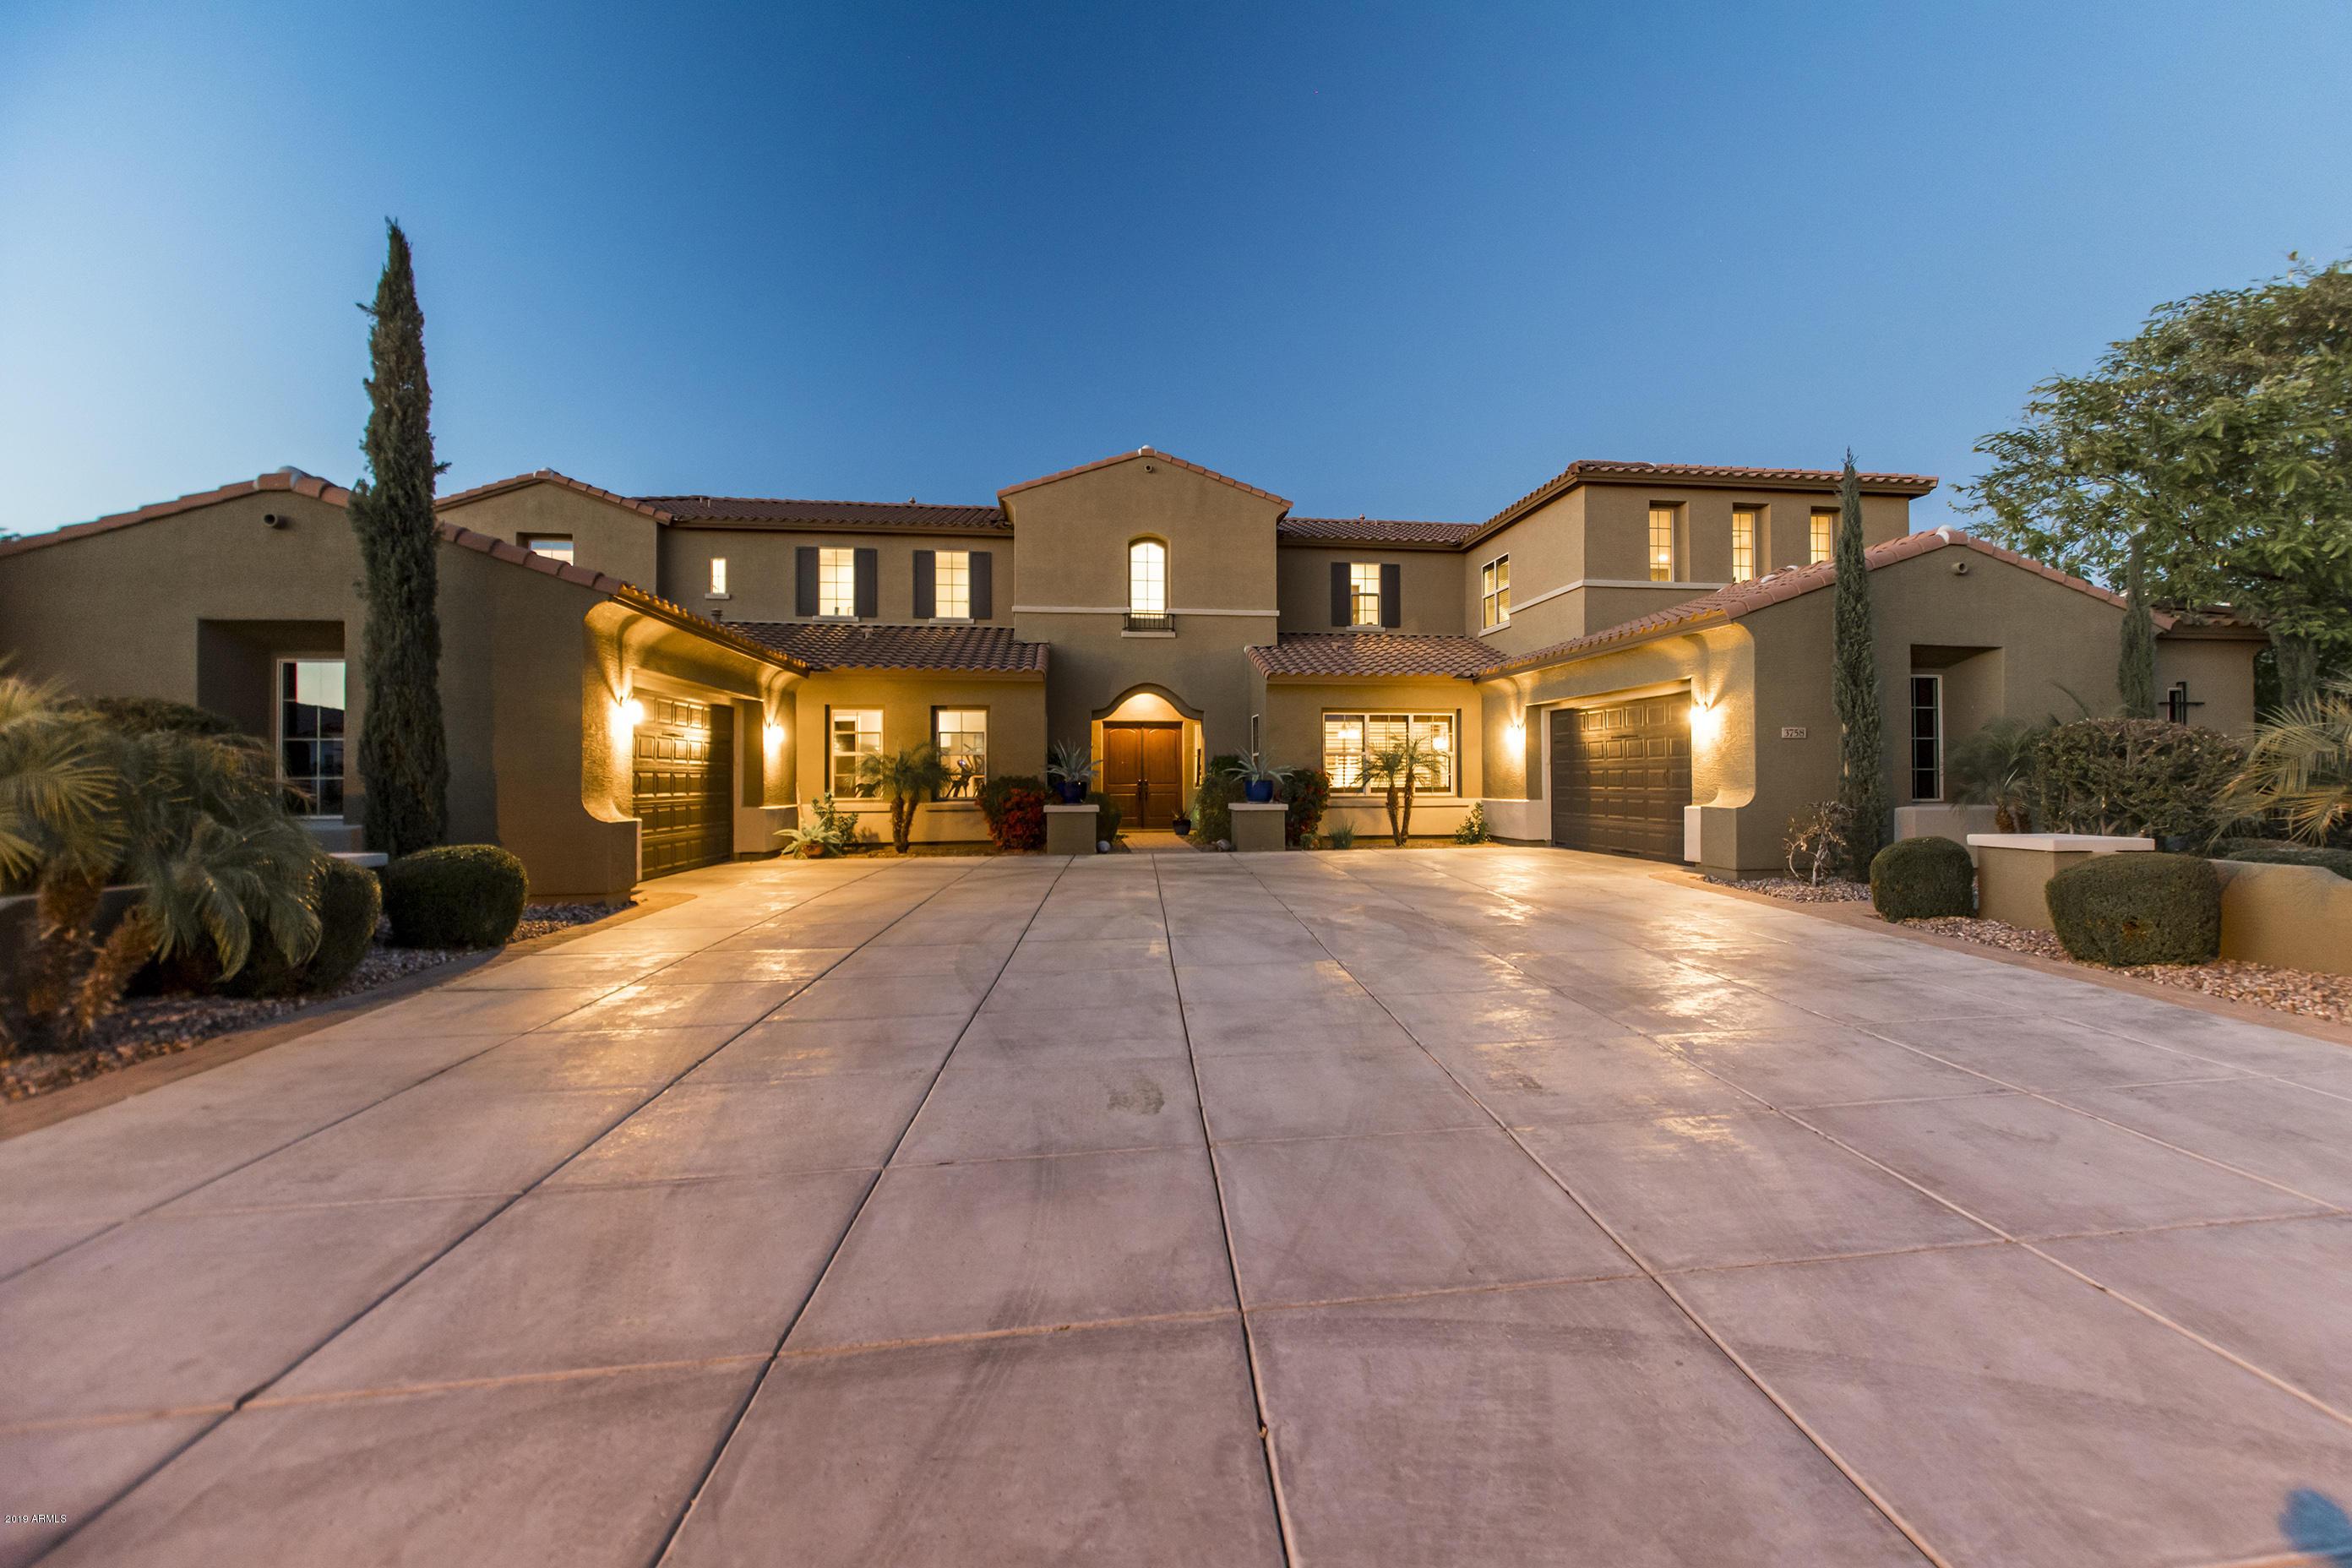 Photo of 3758 E ENCANTO Street, Mesa, AZ 85205